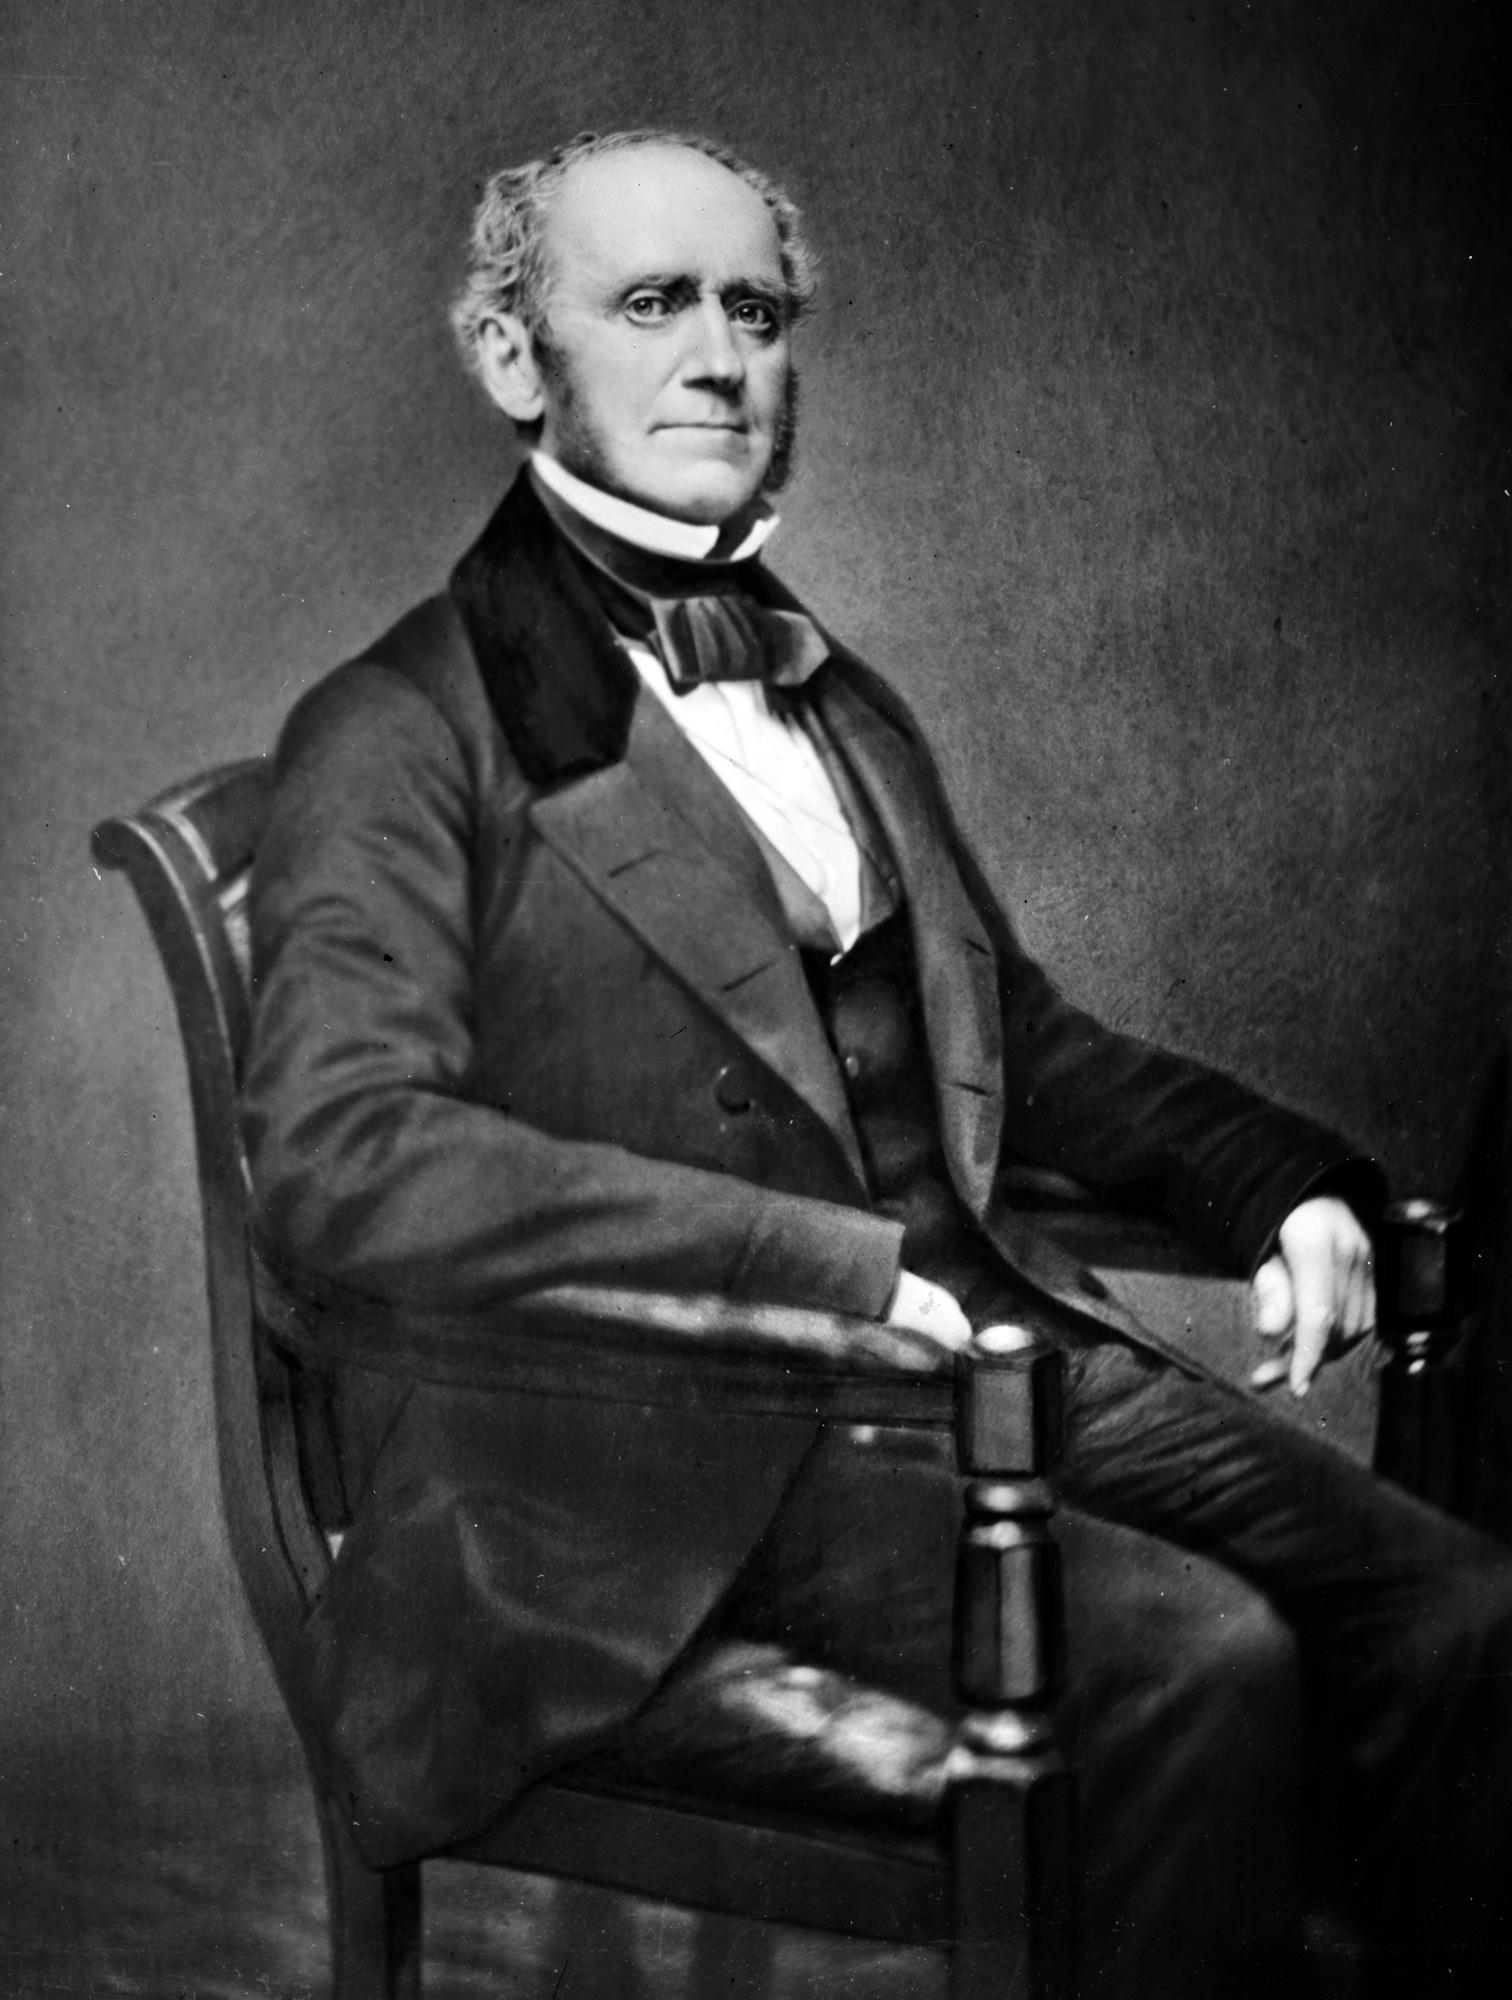 https://upload.wikimedia.org/wikipedia/commons/c/cc/Fitz-Greene_Halleck.jpg